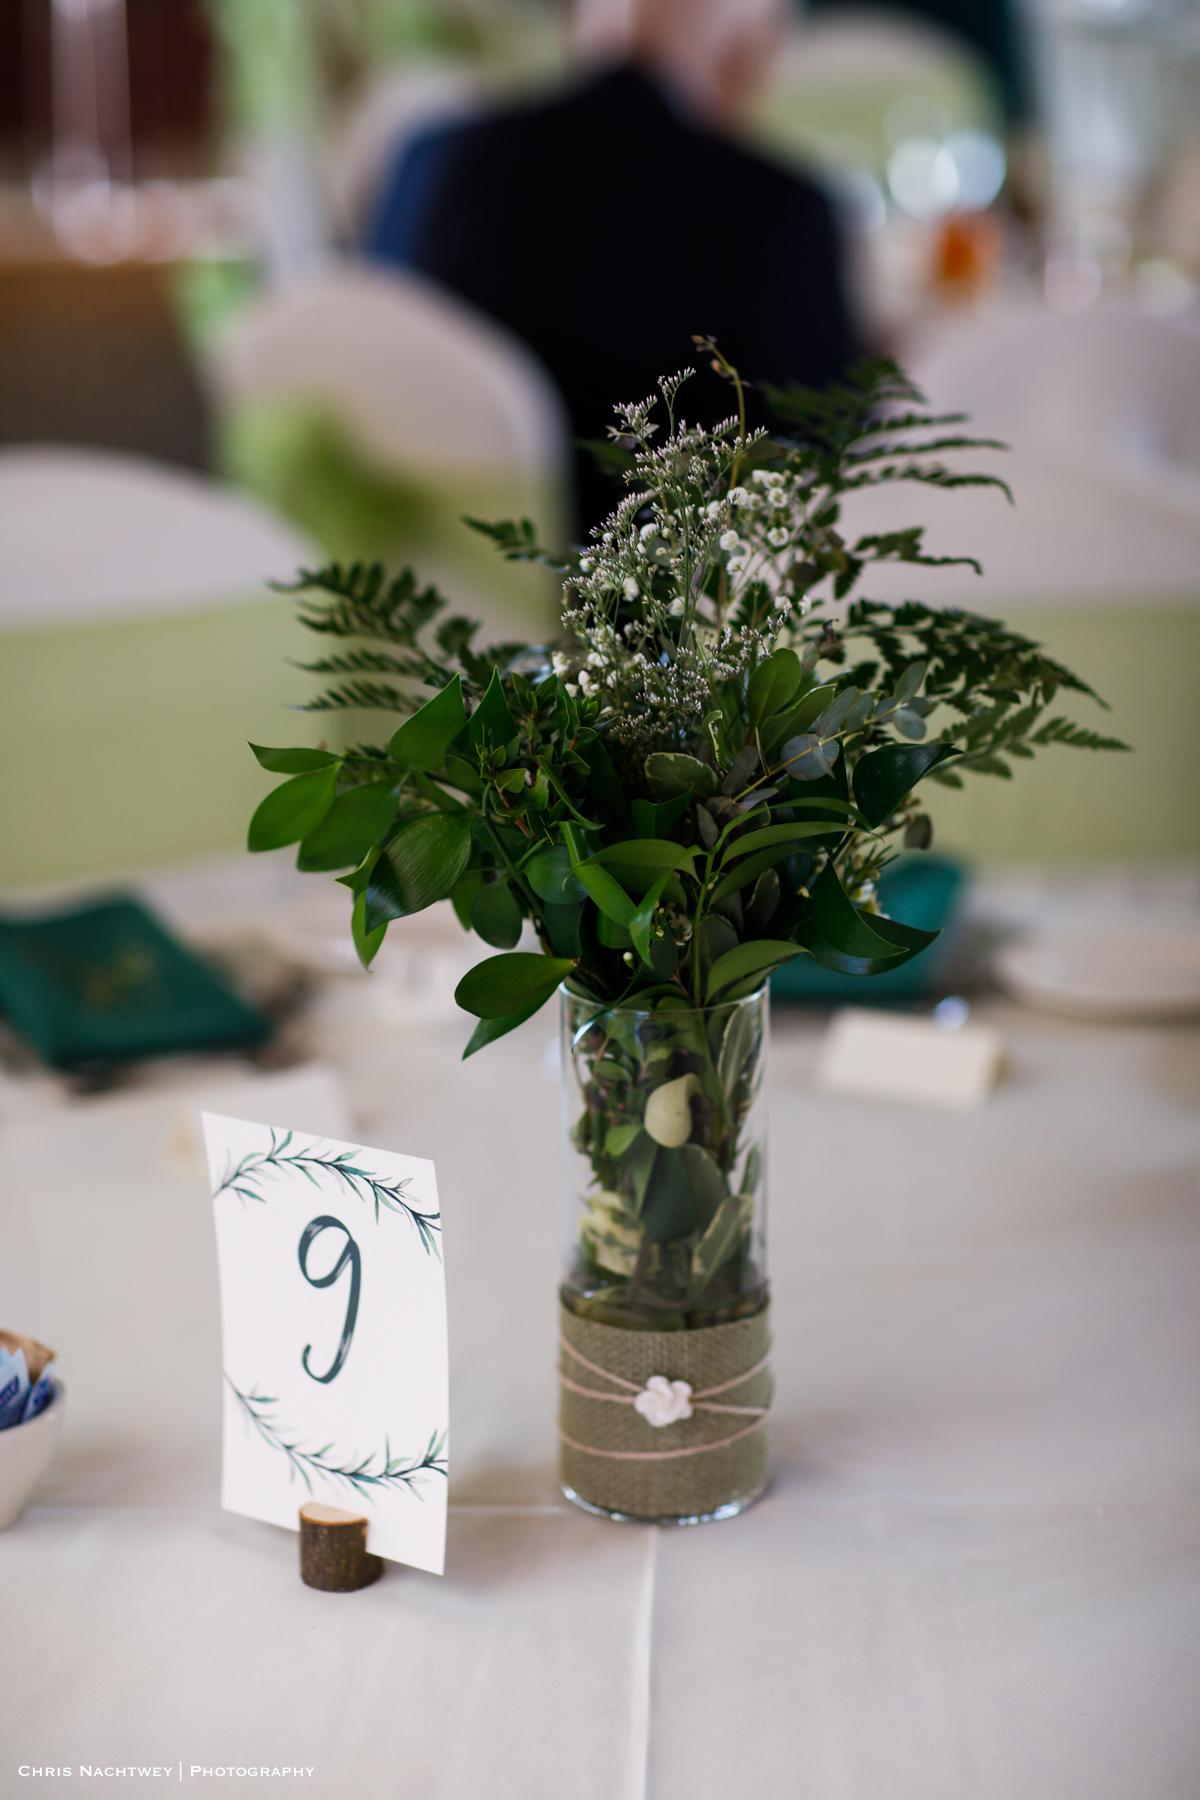 photos-wedding-quidnessett-country-club-ri-chris-nachtwey-photography-2018-45.jpg